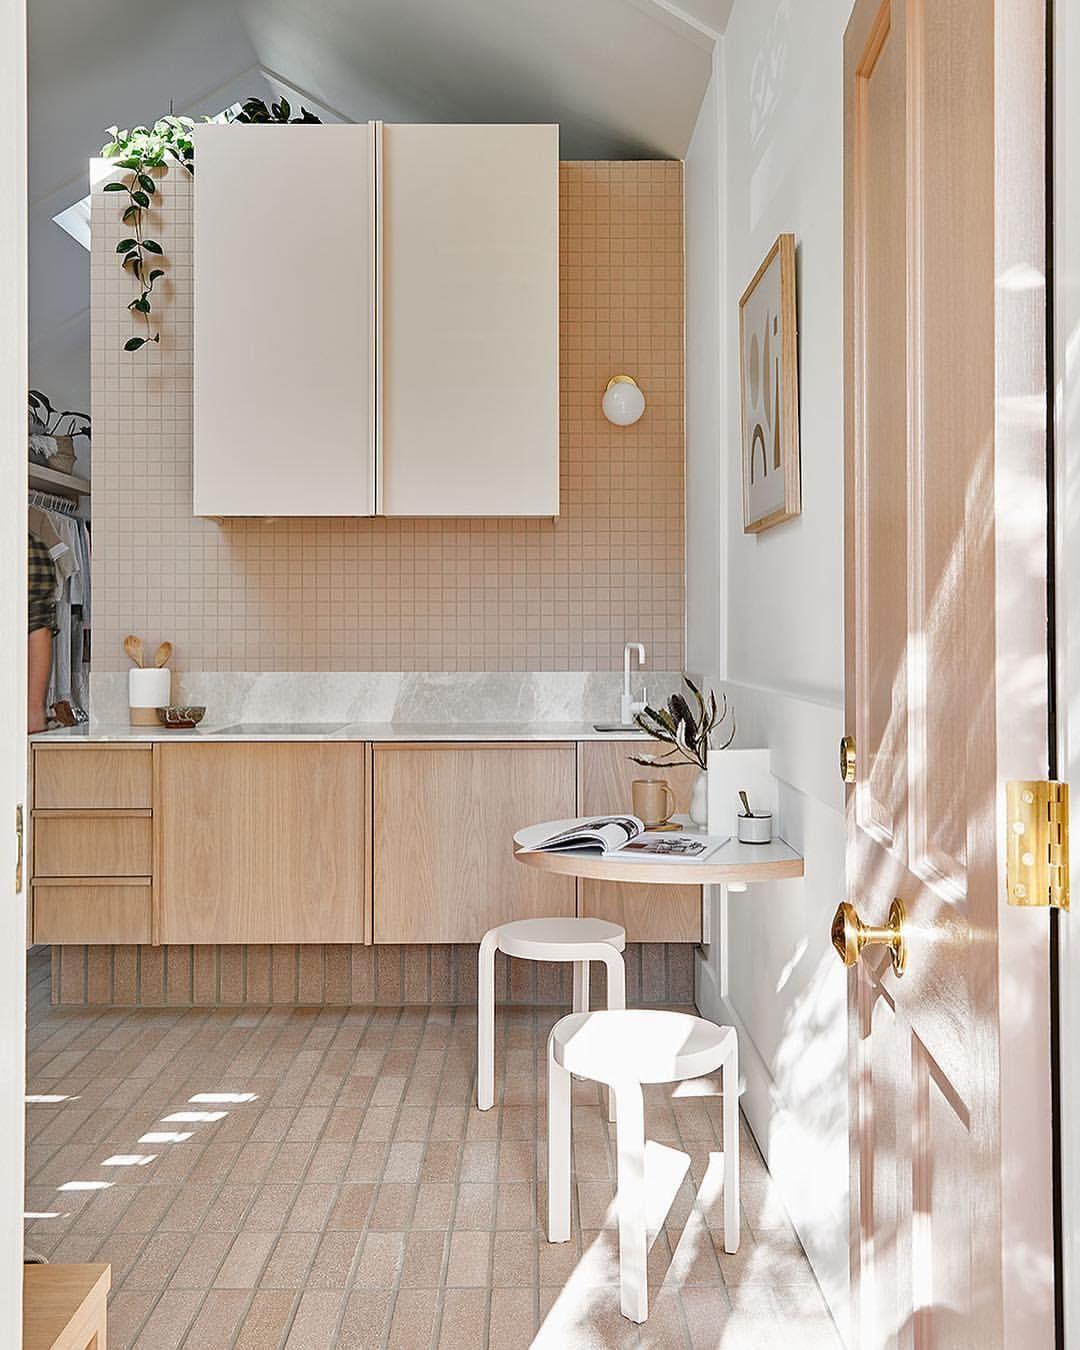 Cozy minimalist home kitchens kitchen ideas windowzy rustic interior wardrobe clothing racks also pin by ecom on decor in design rh pinterest